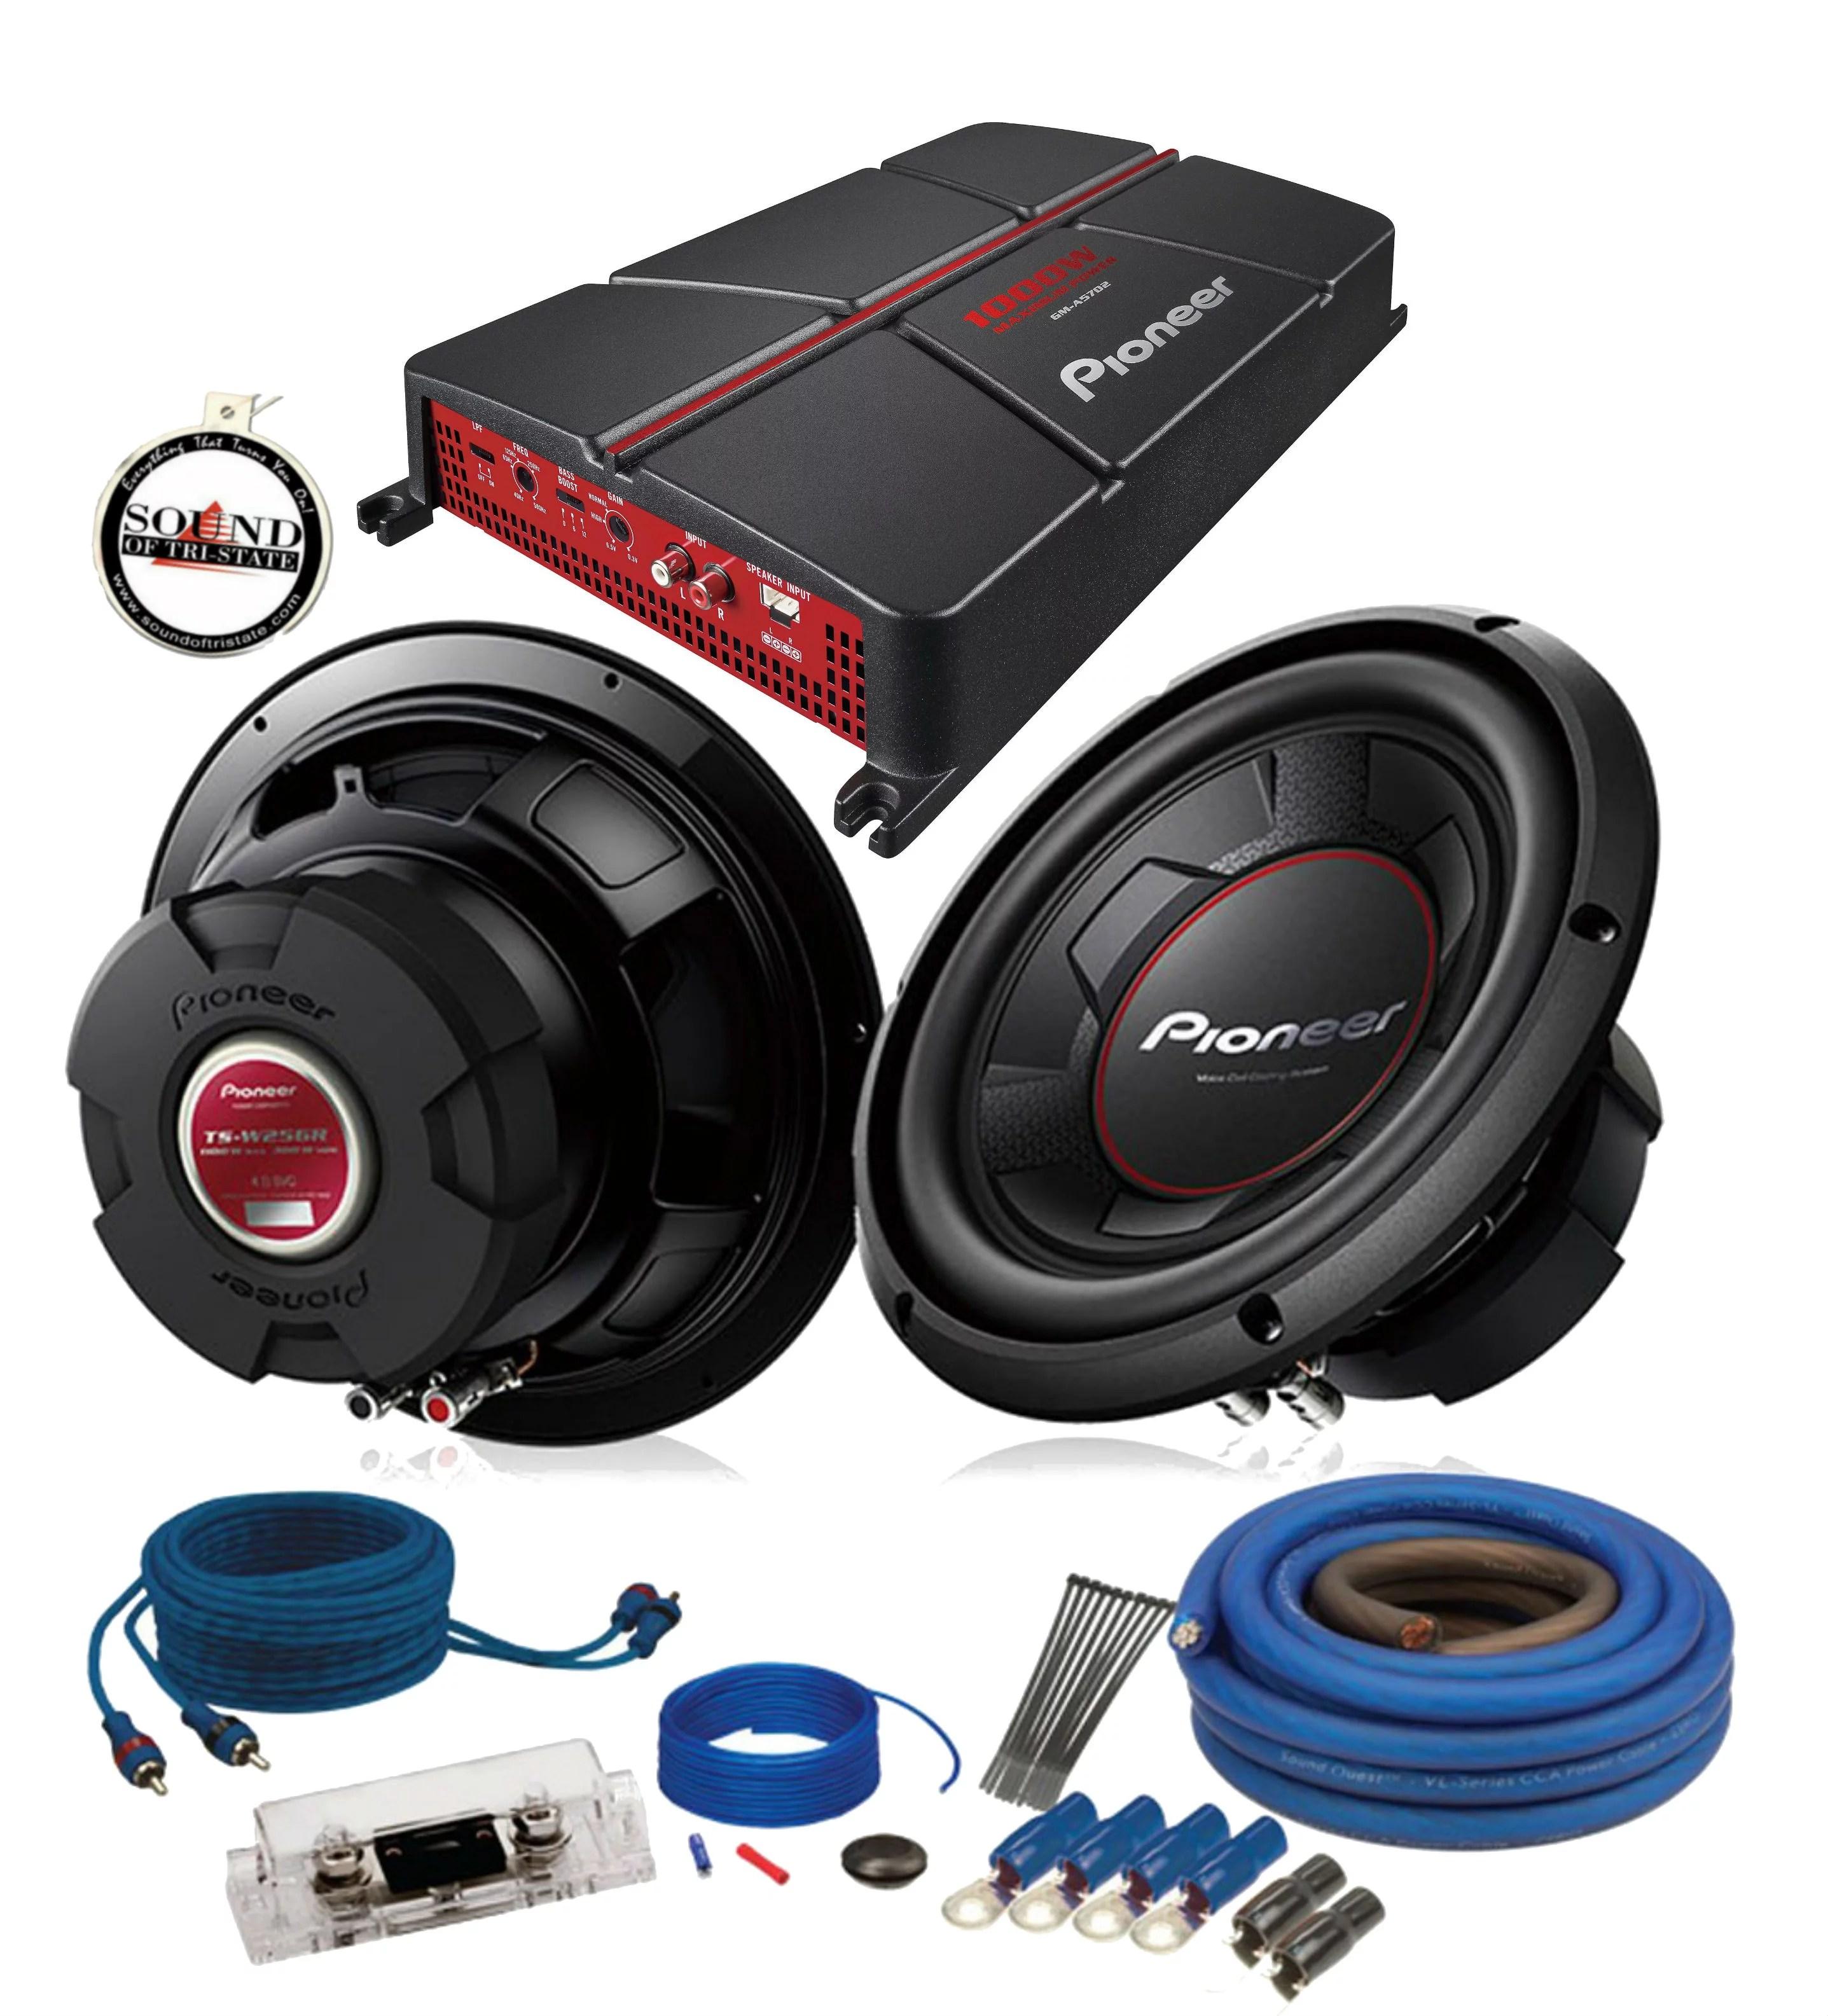 small resolution of pioneer gm a5702 w two ts w256r amp wiring kit walmart com car audio wiring kit walmart